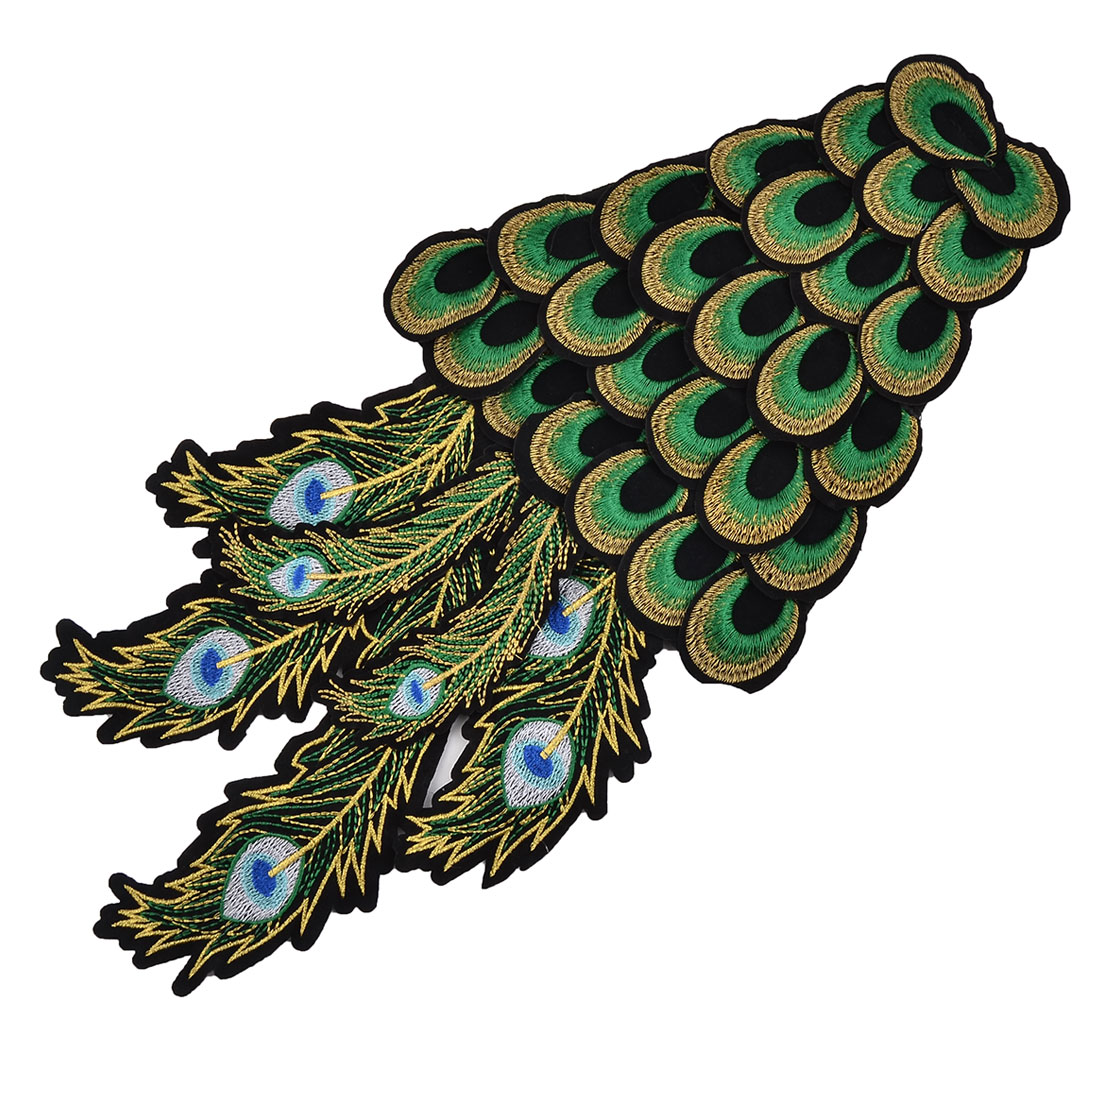 Unique Bargains Polyester Peacock Shape DIY Craft Sewing Clothes Patch Decor Lace Applique Green